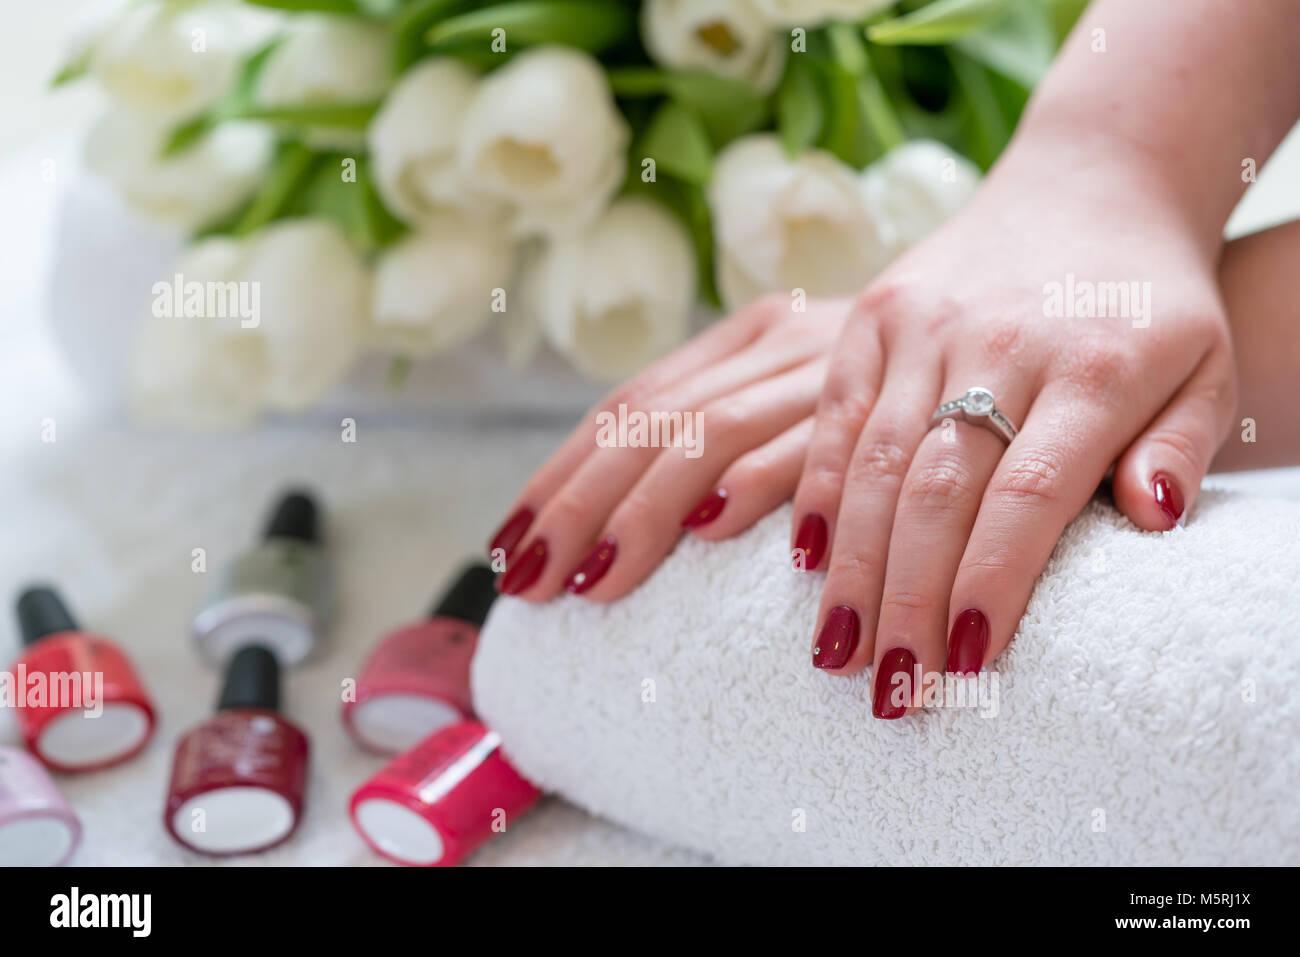 Red Polished Nails Stockfotos & Red Polished Nails Bilder - Alamy